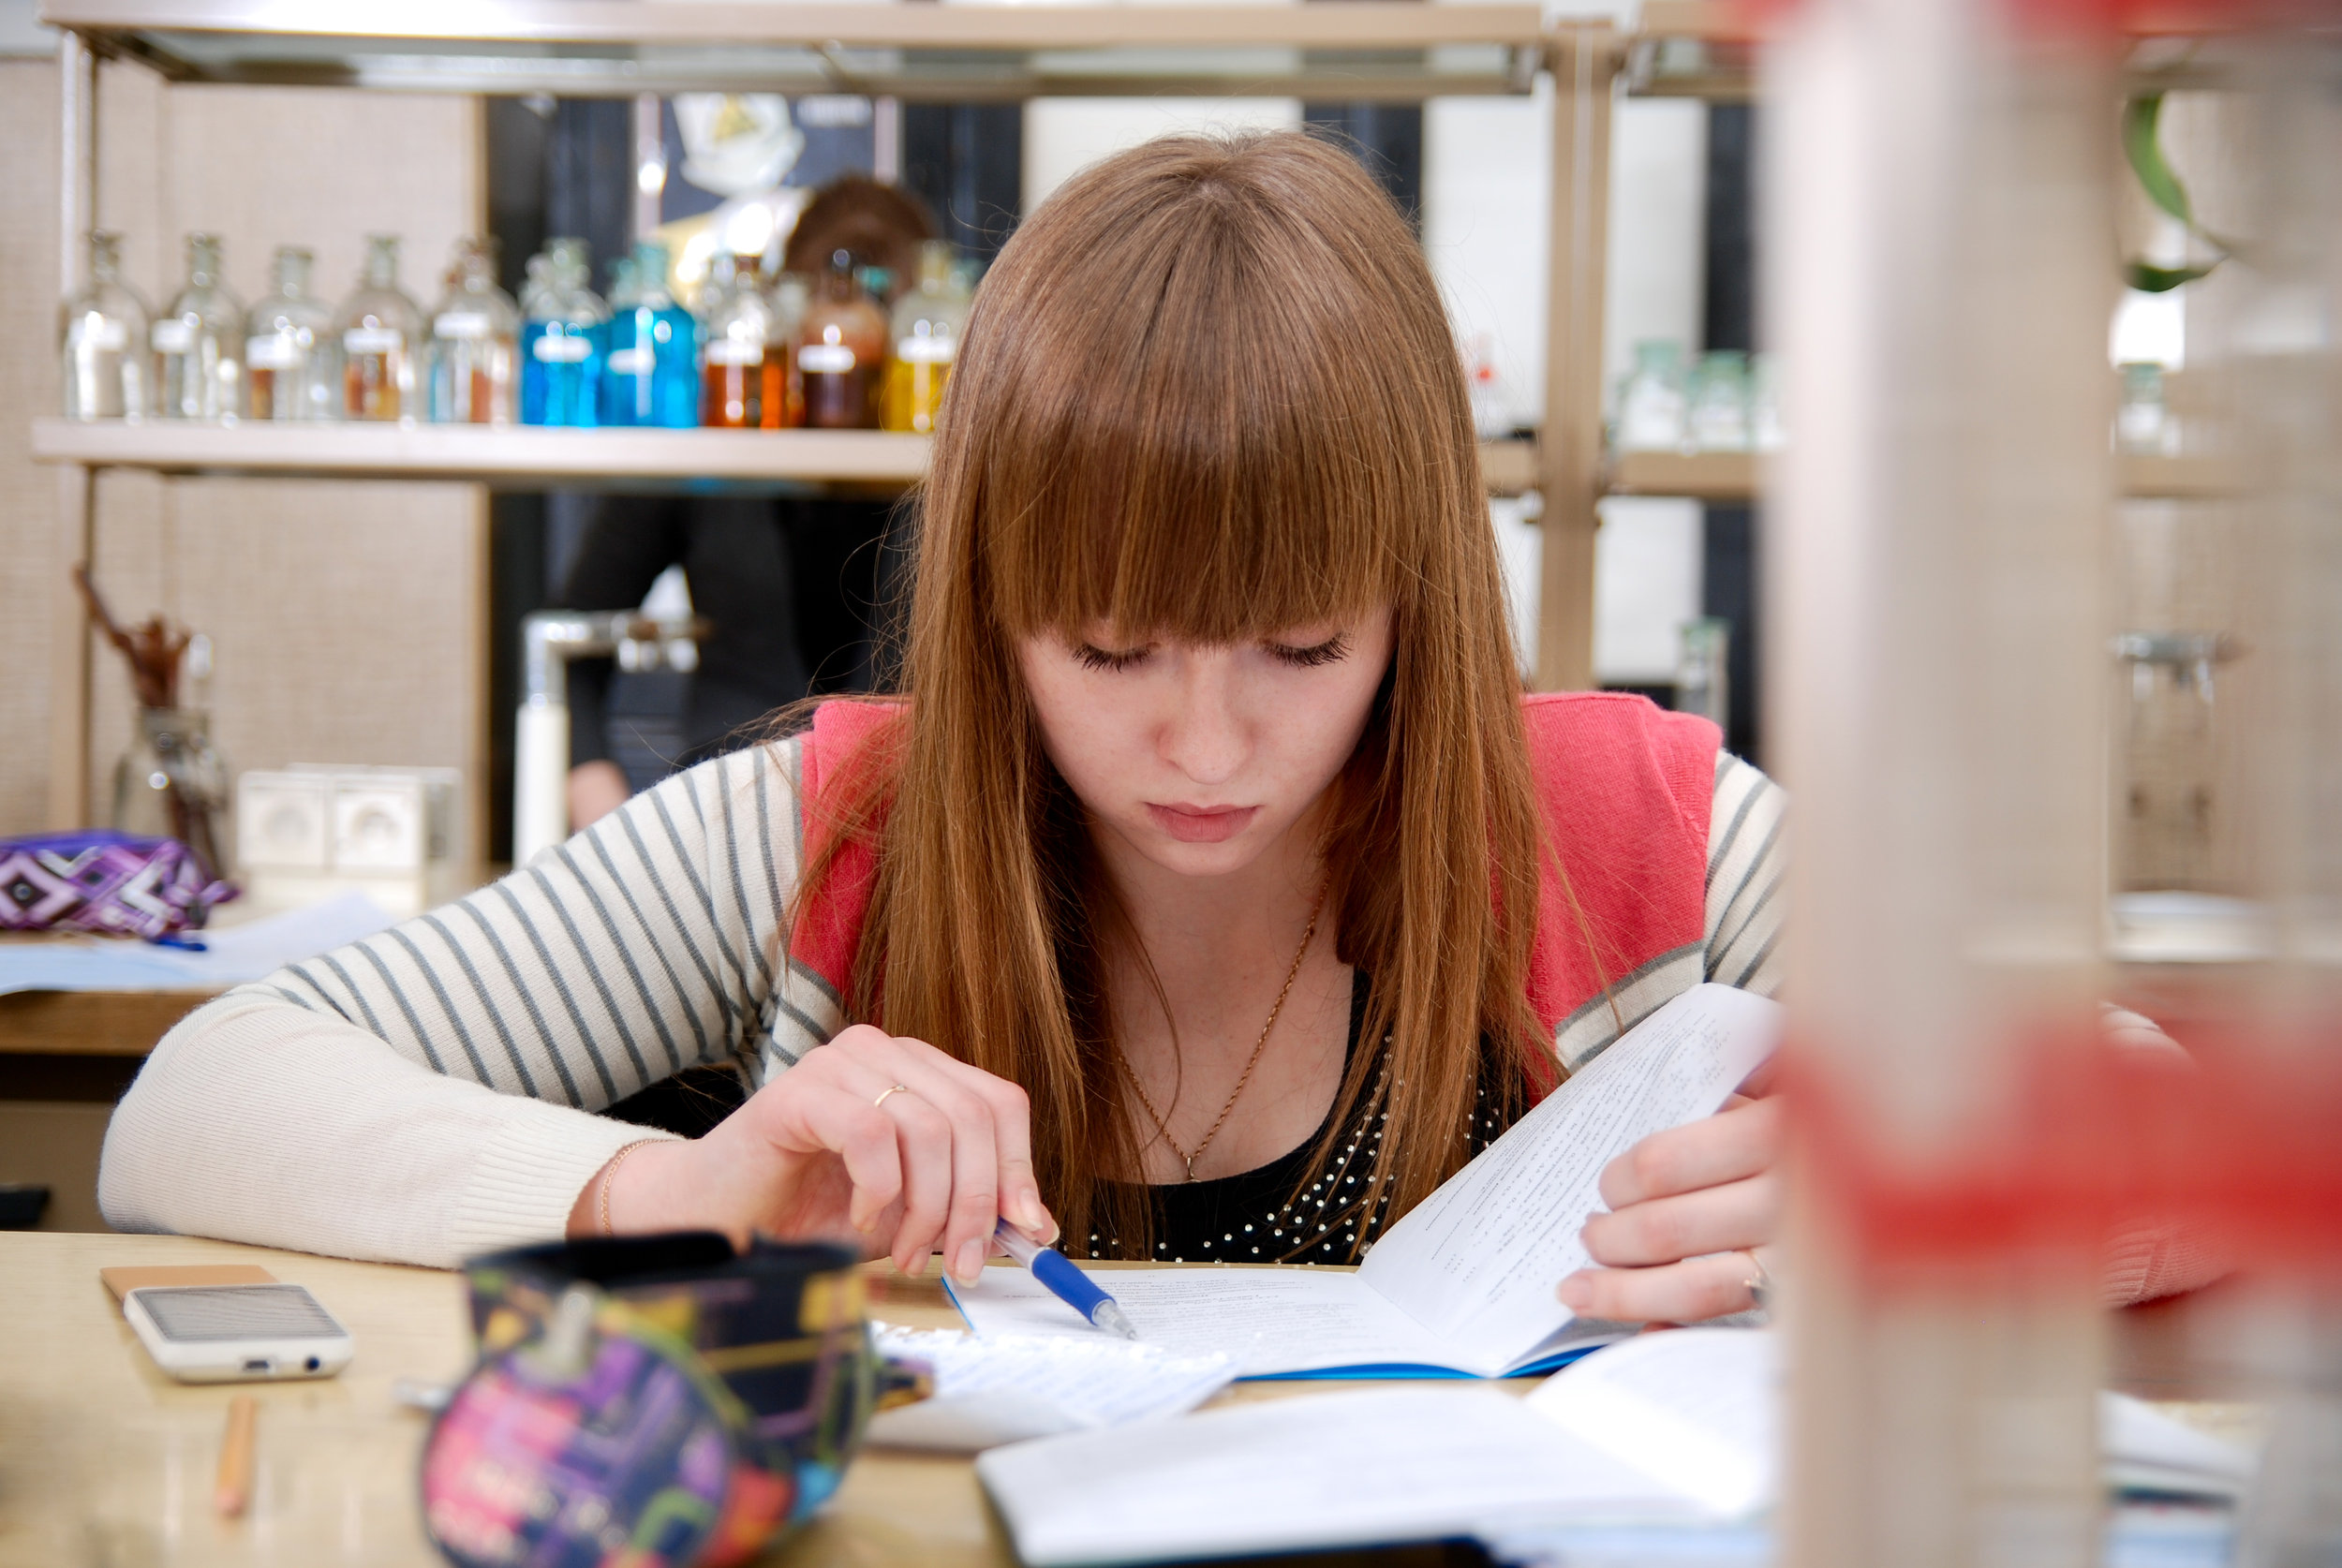 062661756-student-work-laboratory-chemis.jpeg